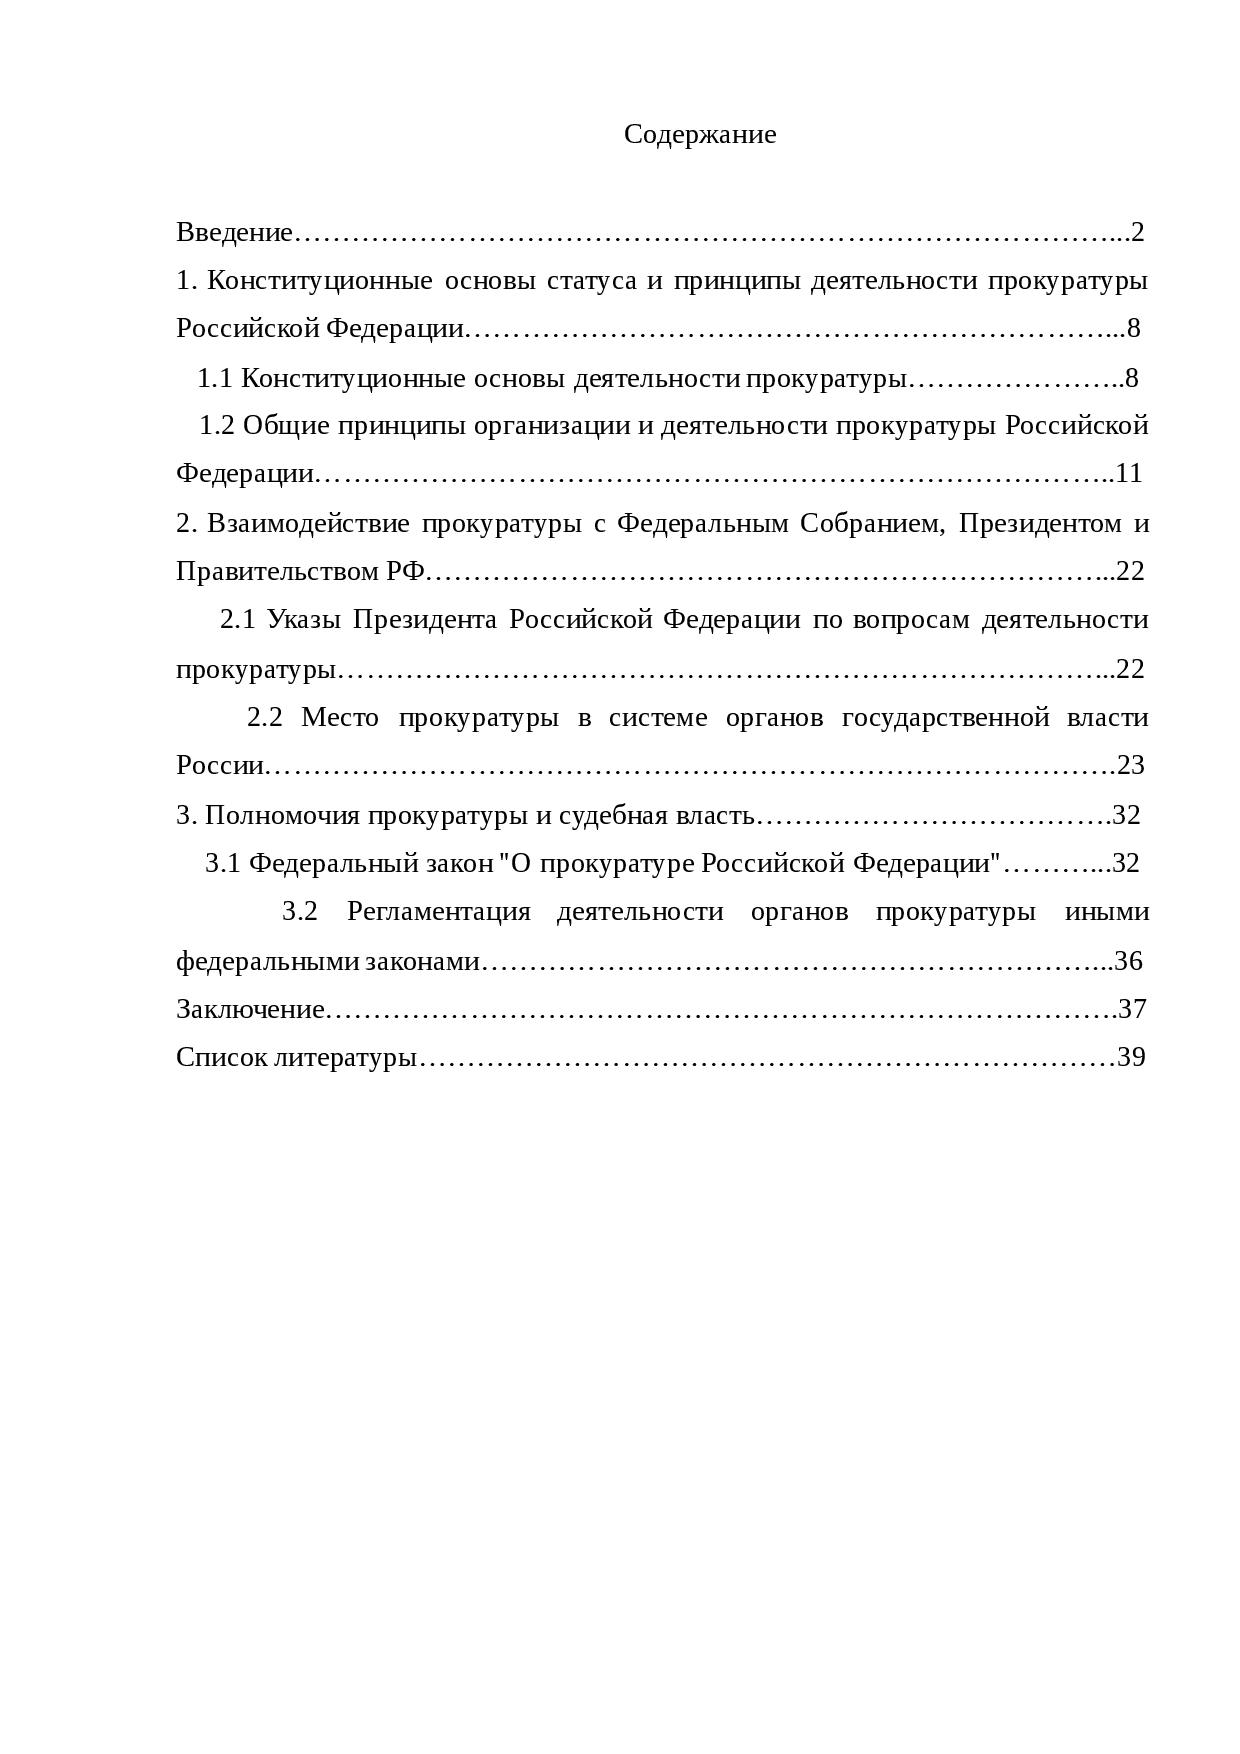 система прокуратуры рф схема